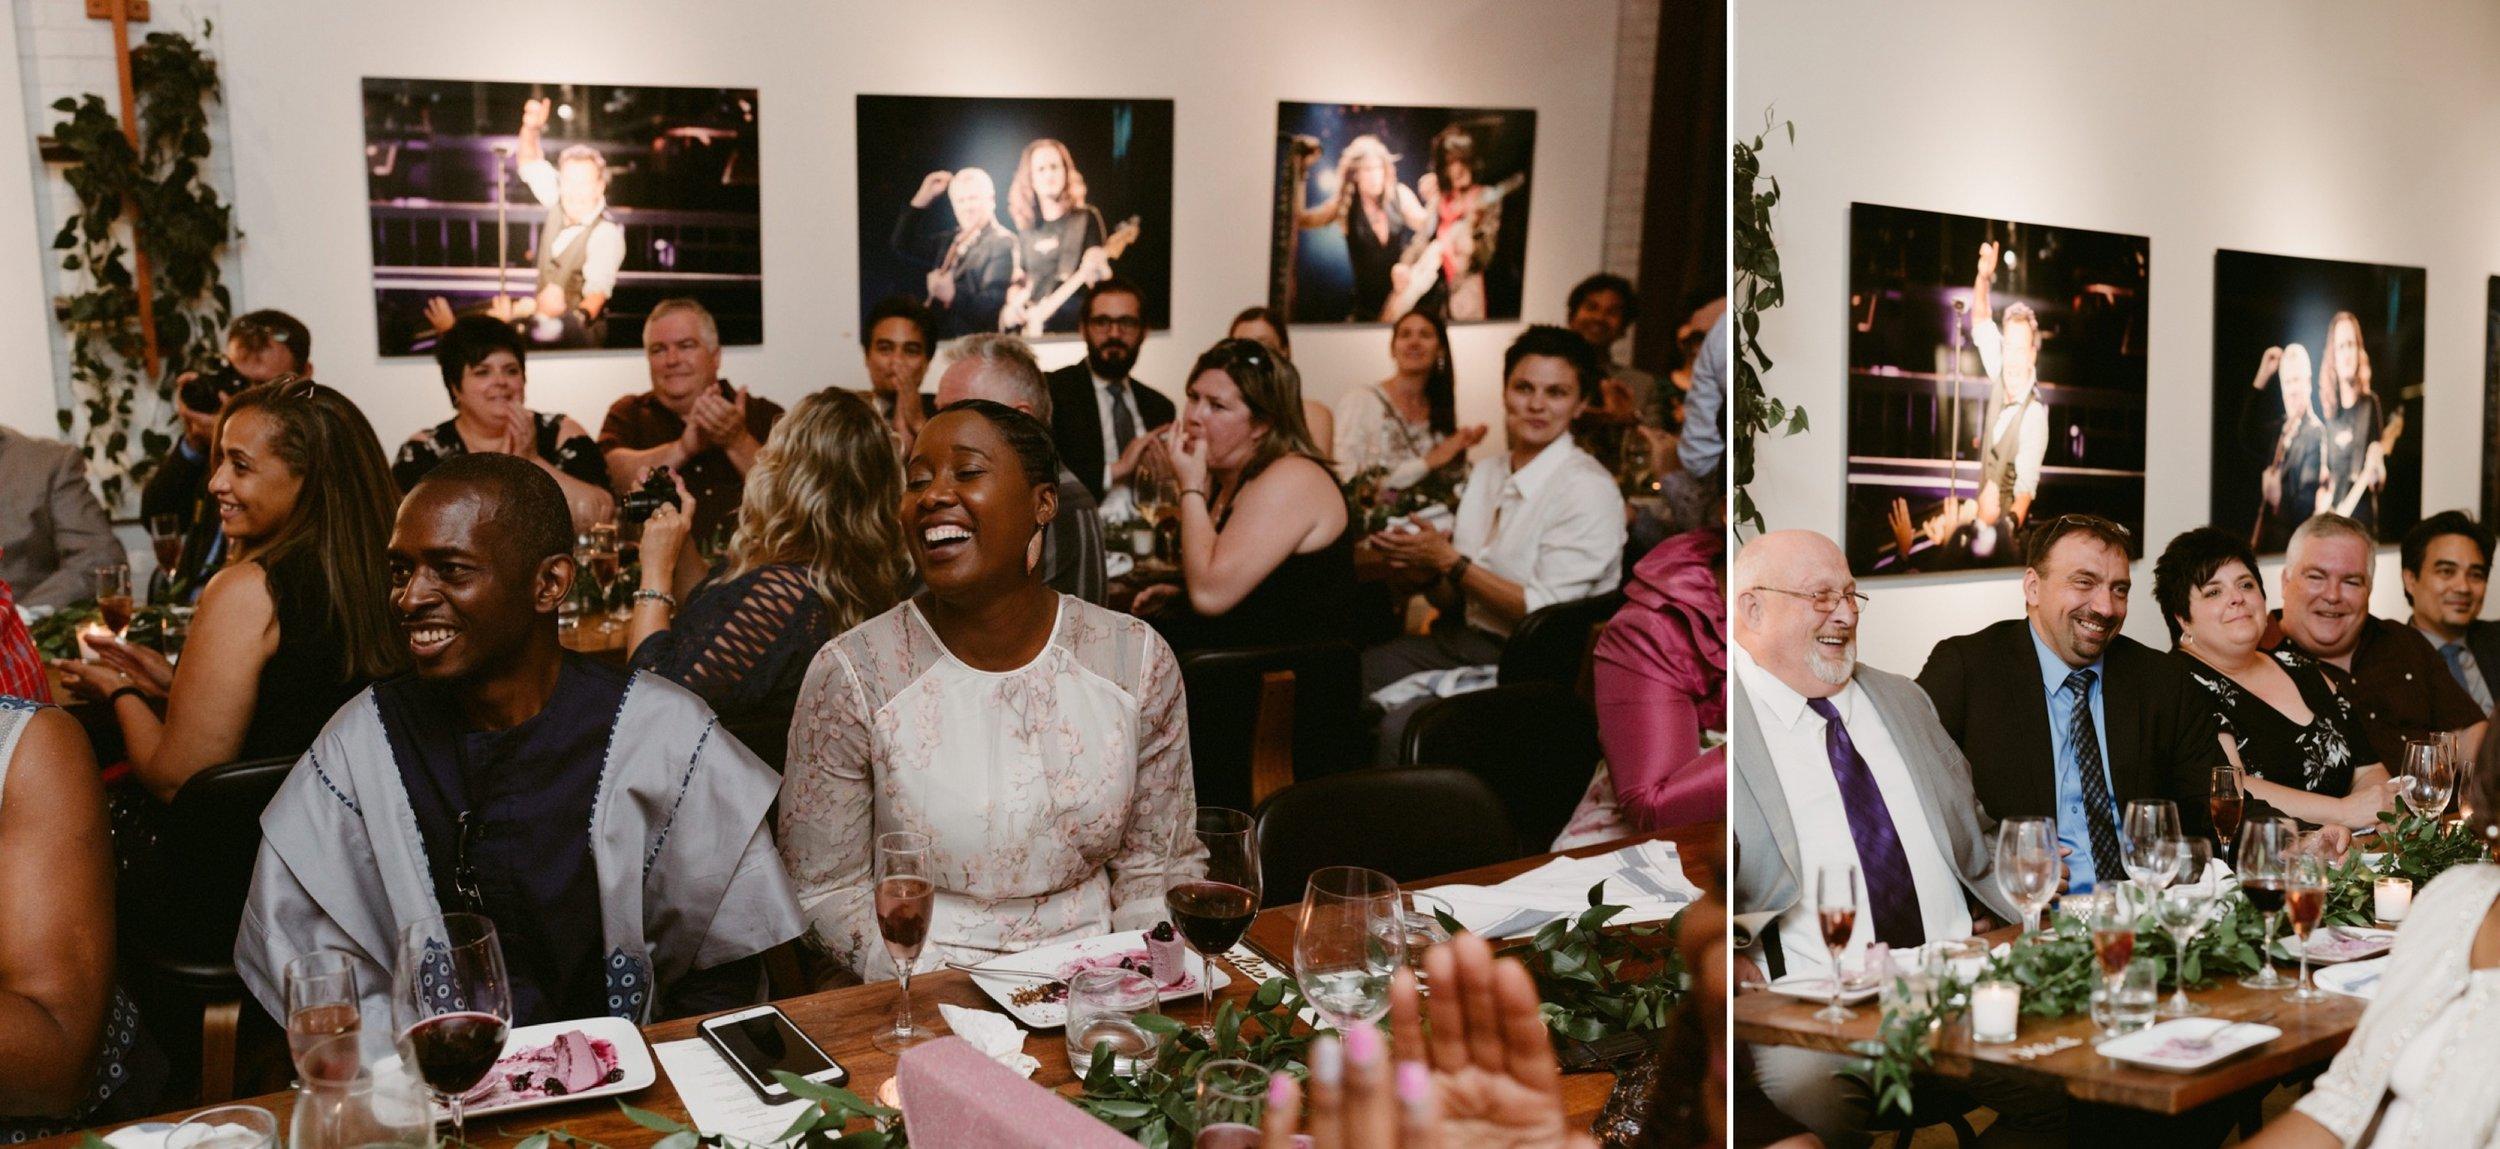 111_Spadina House Wedding (642 of 748)_Spadina House Wedding (622 of 748)_Wedding_Boehmer_Restaurant_Toronto_intimate.jpg